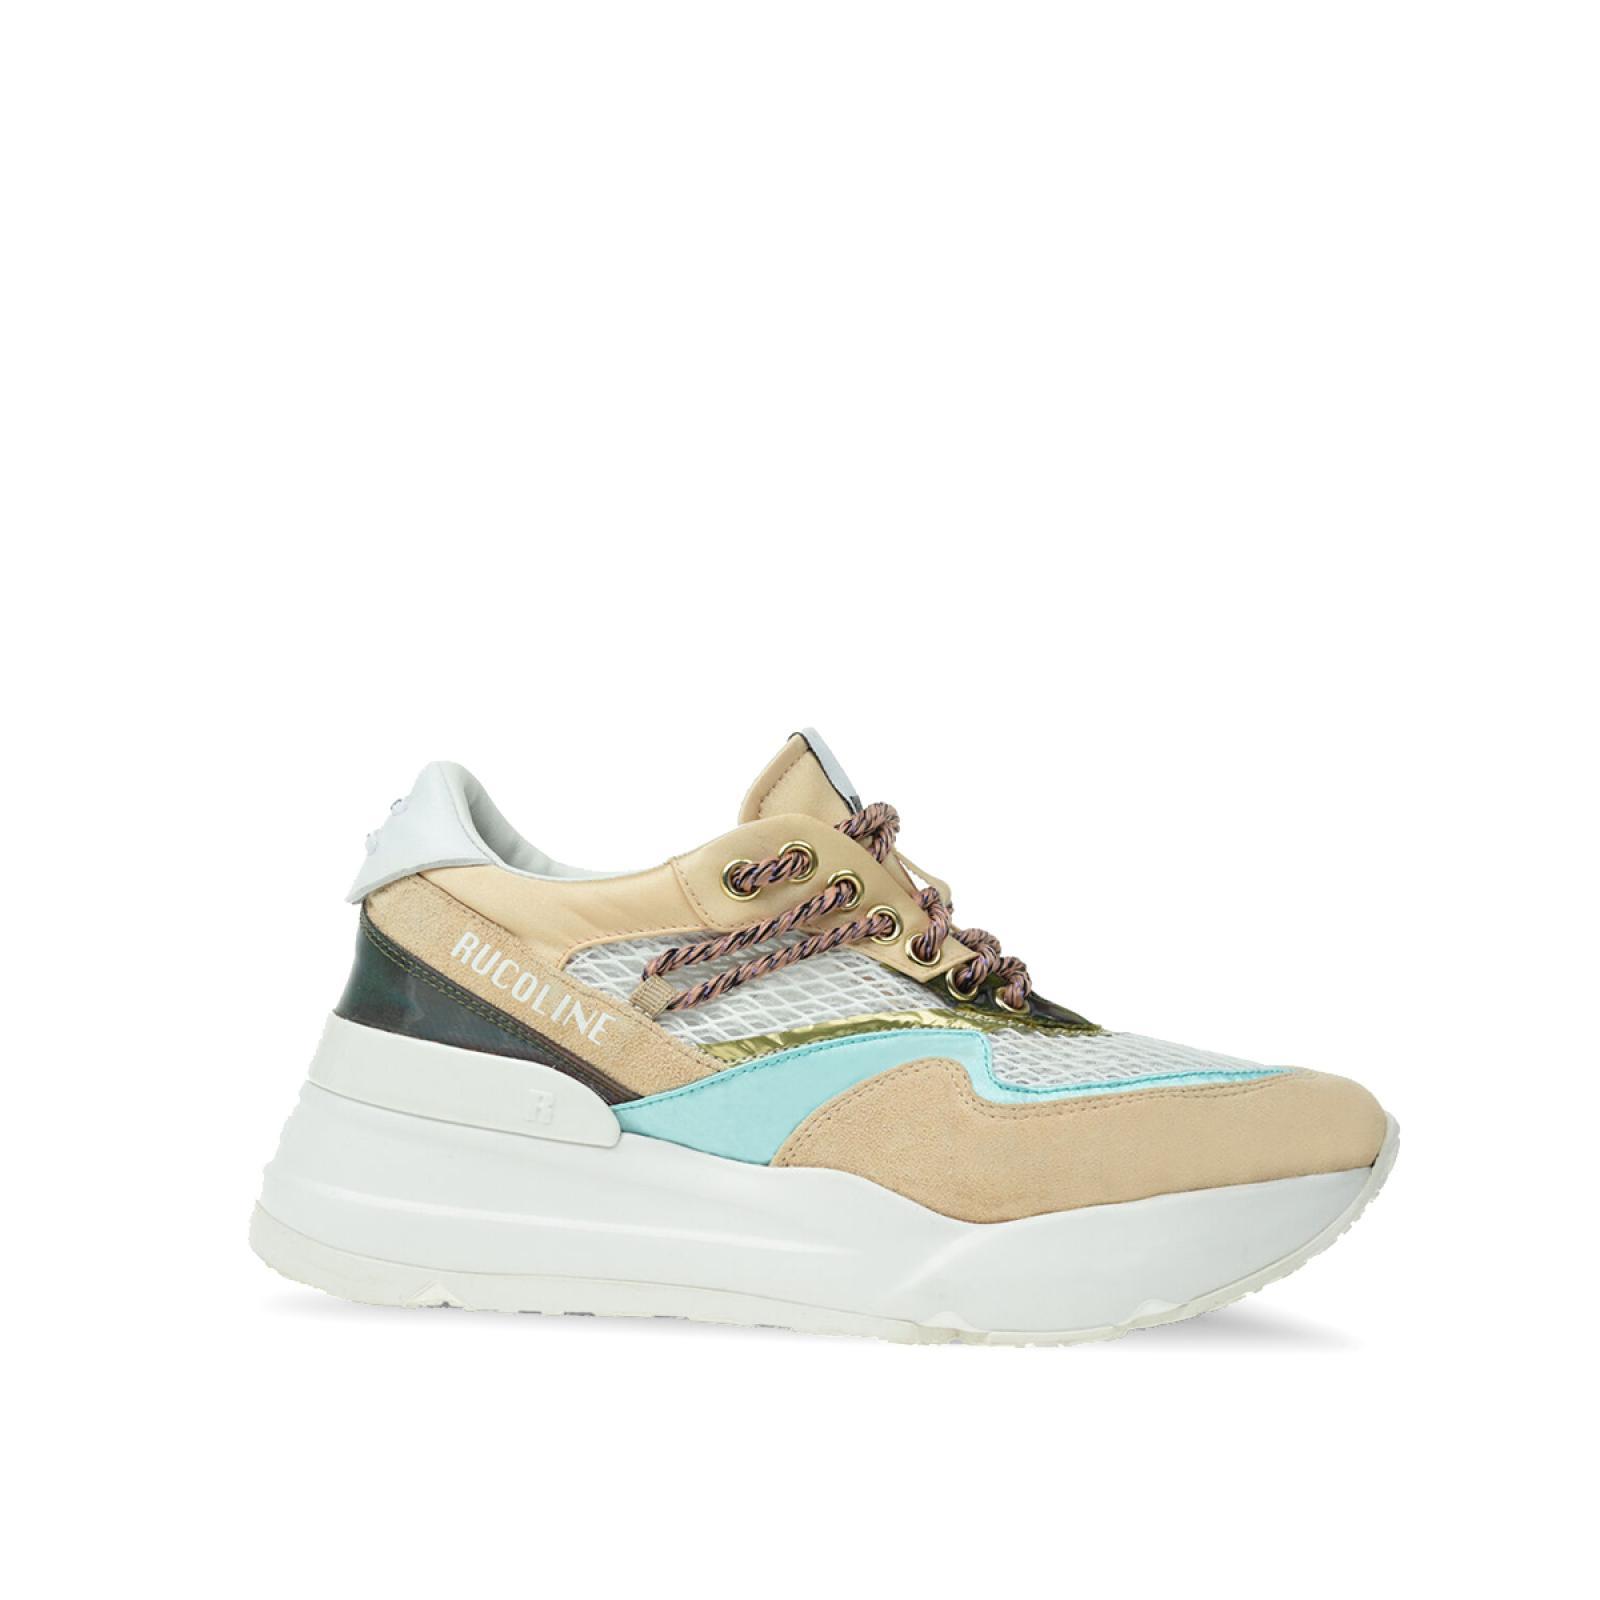 RUCO Sneakers R-Evolve 4043 Satin Air - 1